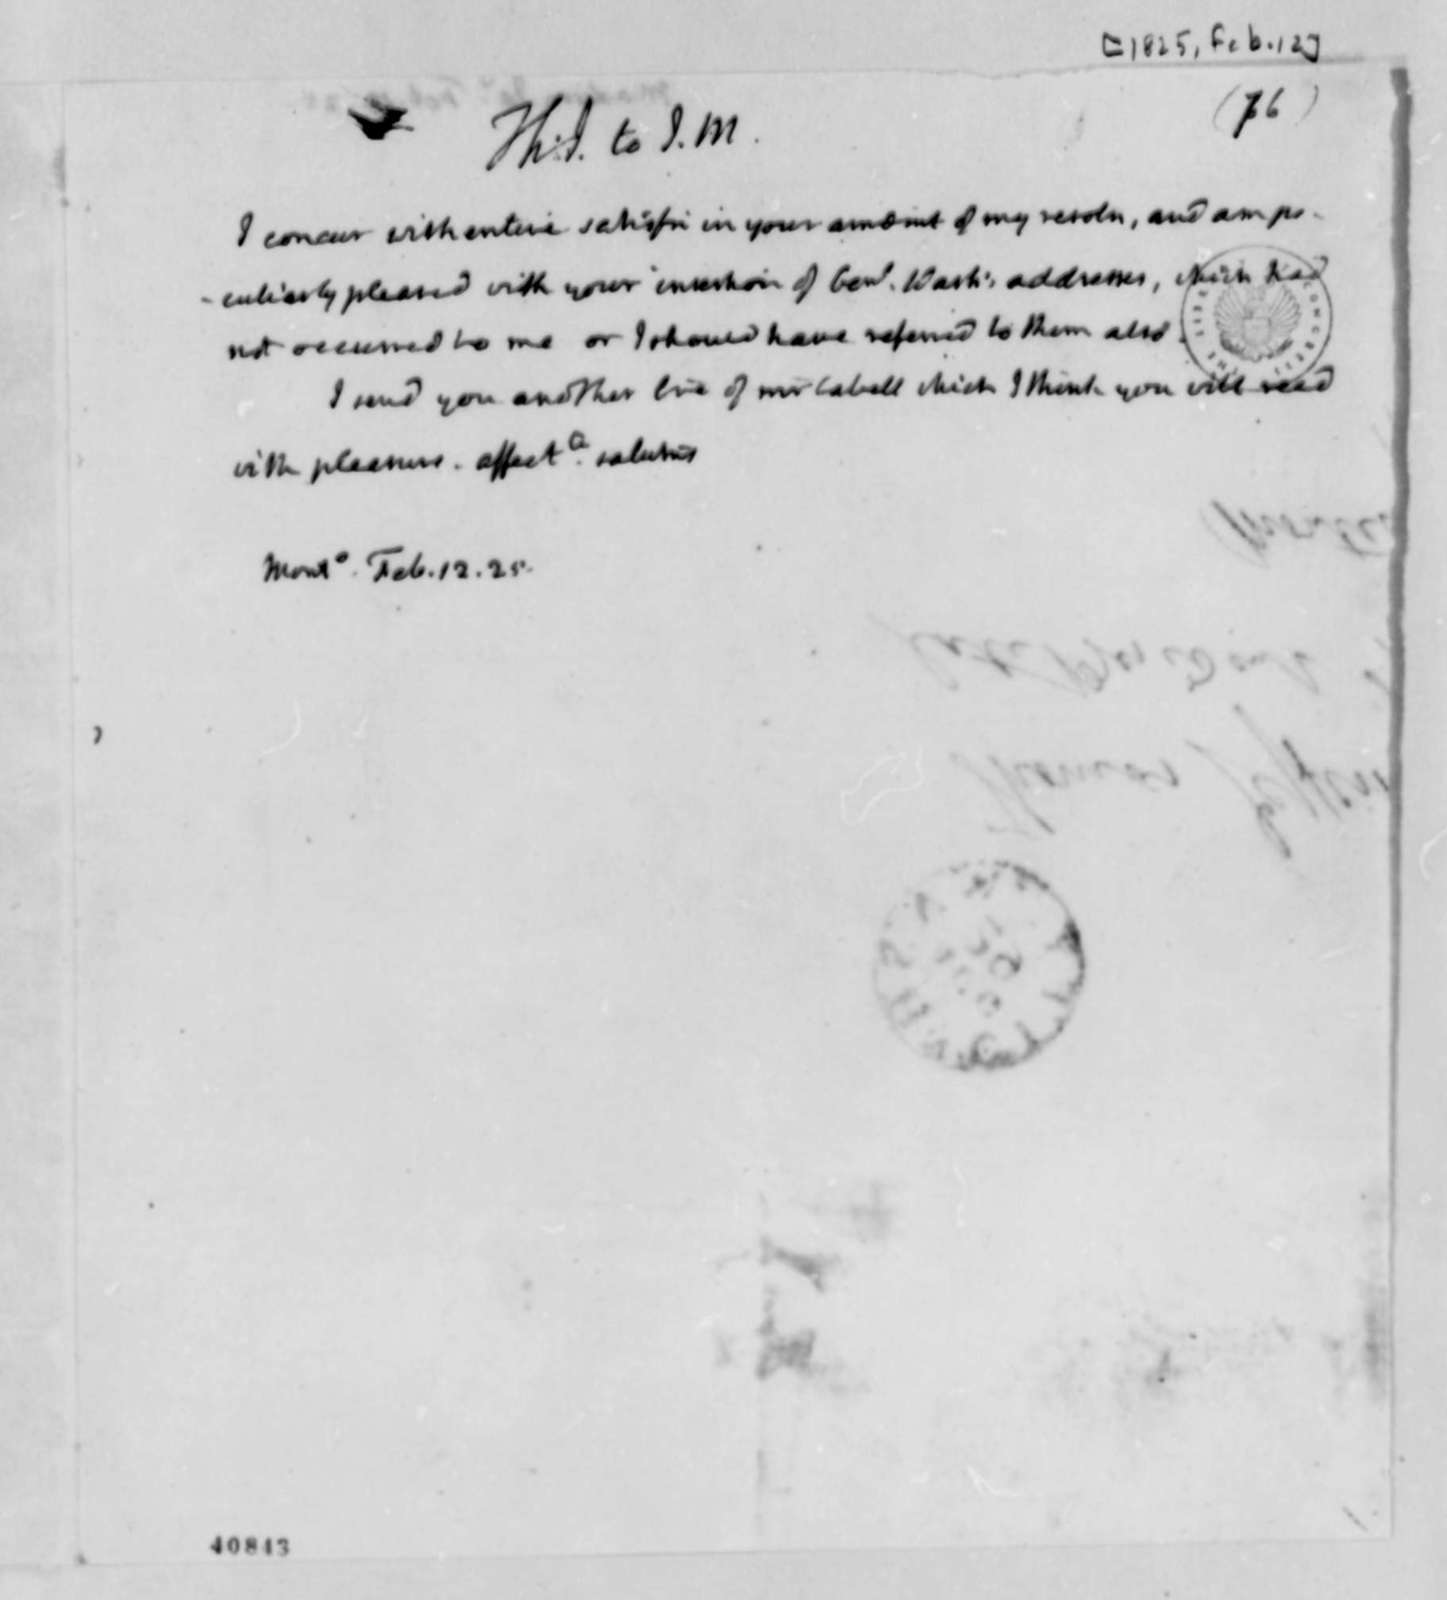 Thomas Jefferson to James Madison, February 12, 1825